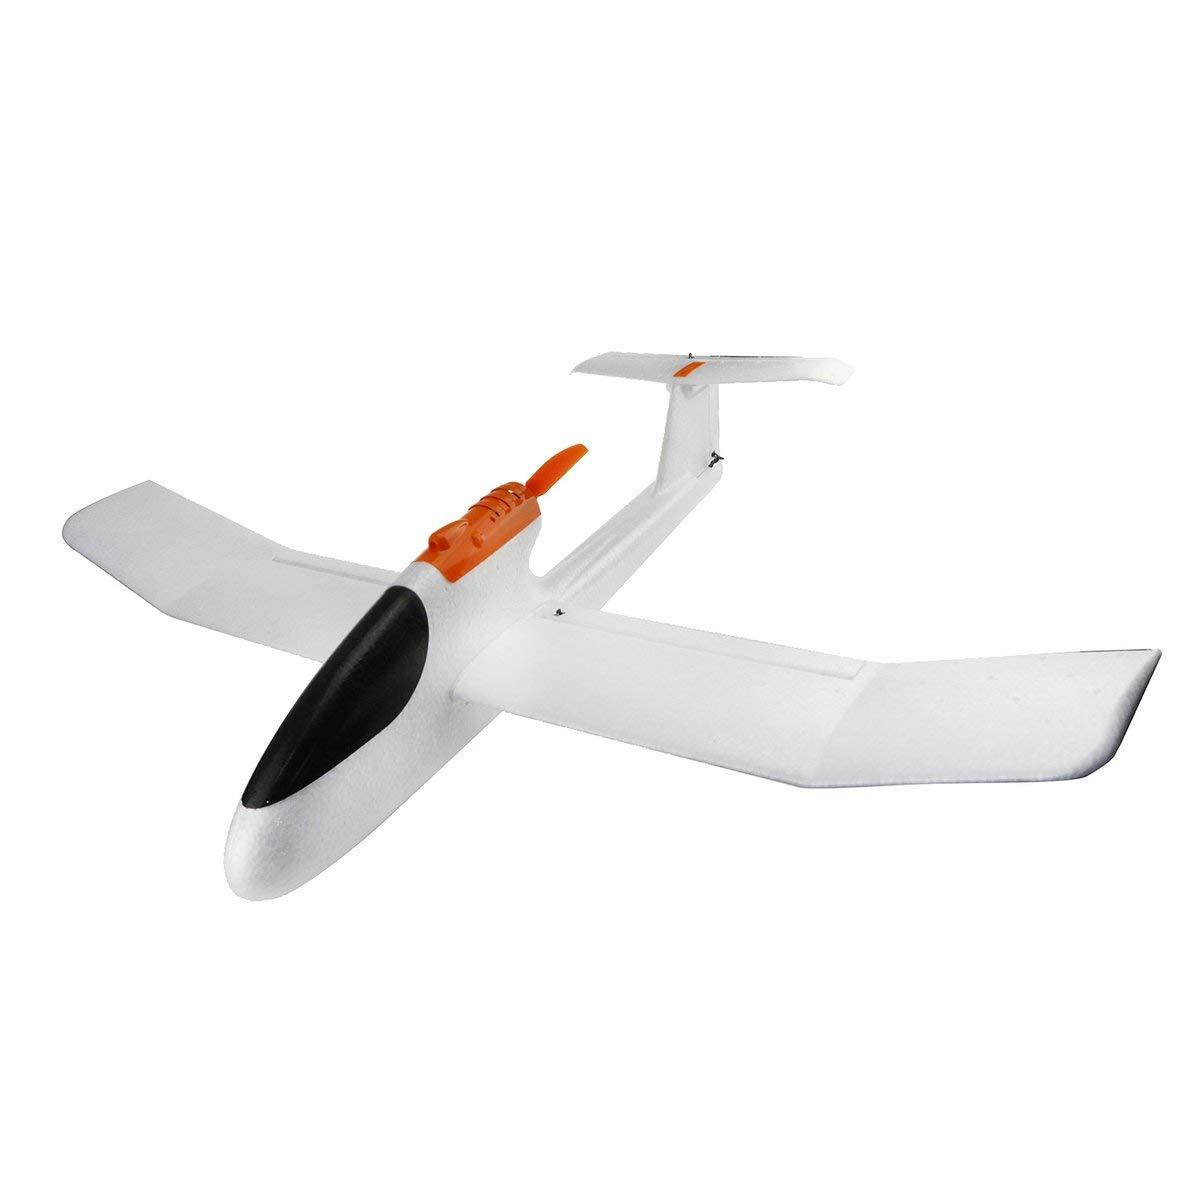 Gugutogo Drone Dron ZSX-750 Spannweite RTF Brushed RC Flugzeug 2.4GHz RC Flugzeug 4CH EPP RC